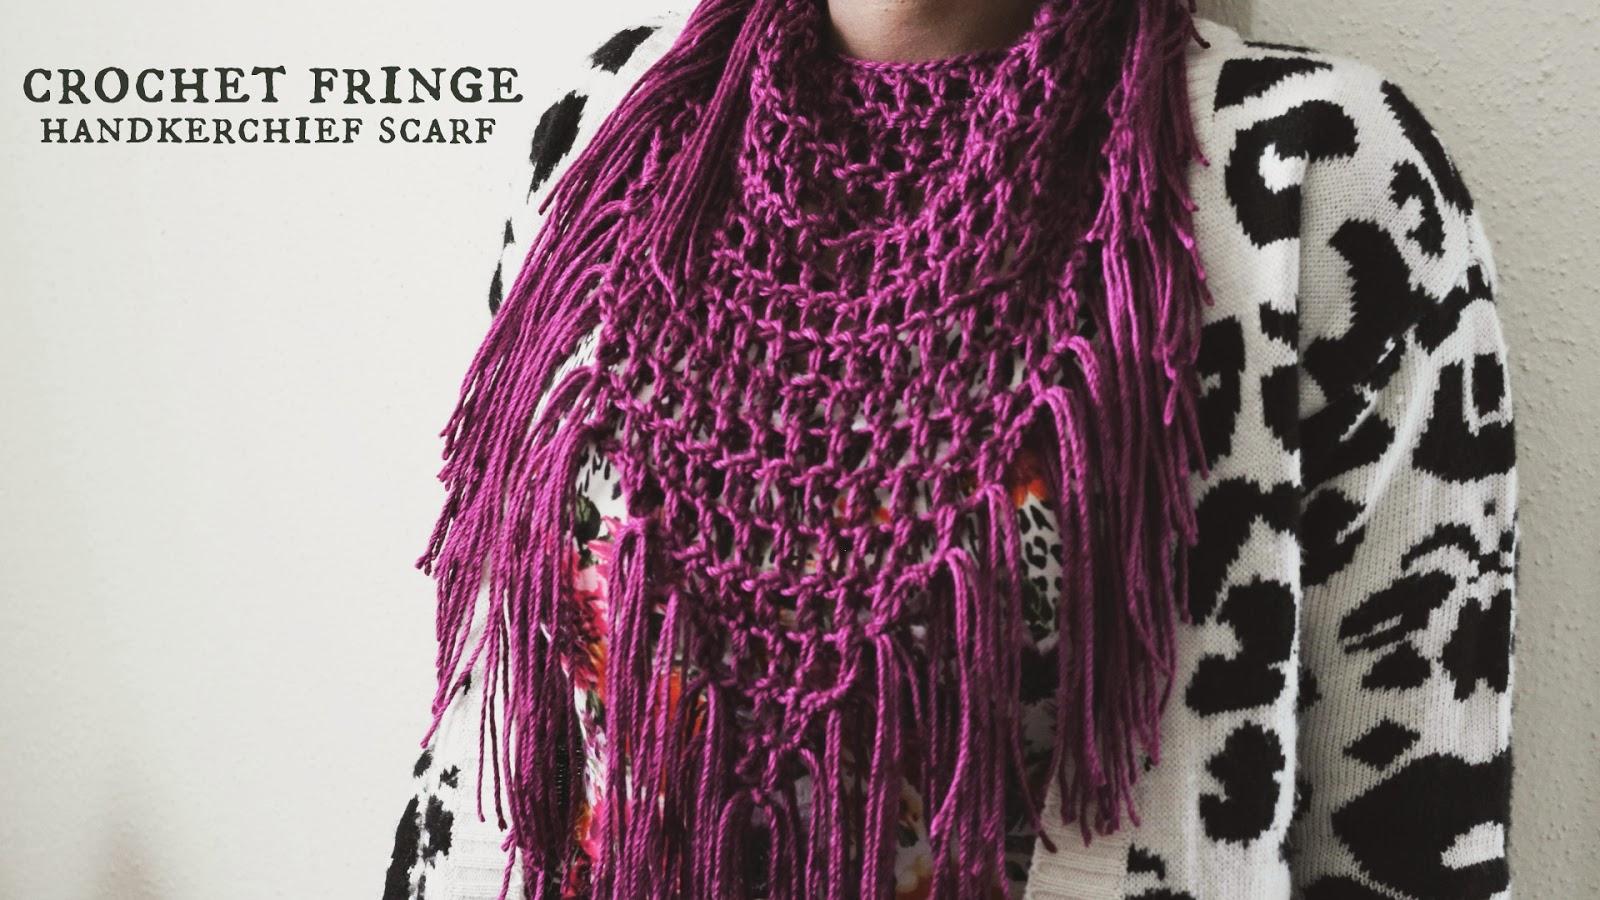 the dream crochet blog.: DIY: Crochet Fringe Handkerchief Scarf.